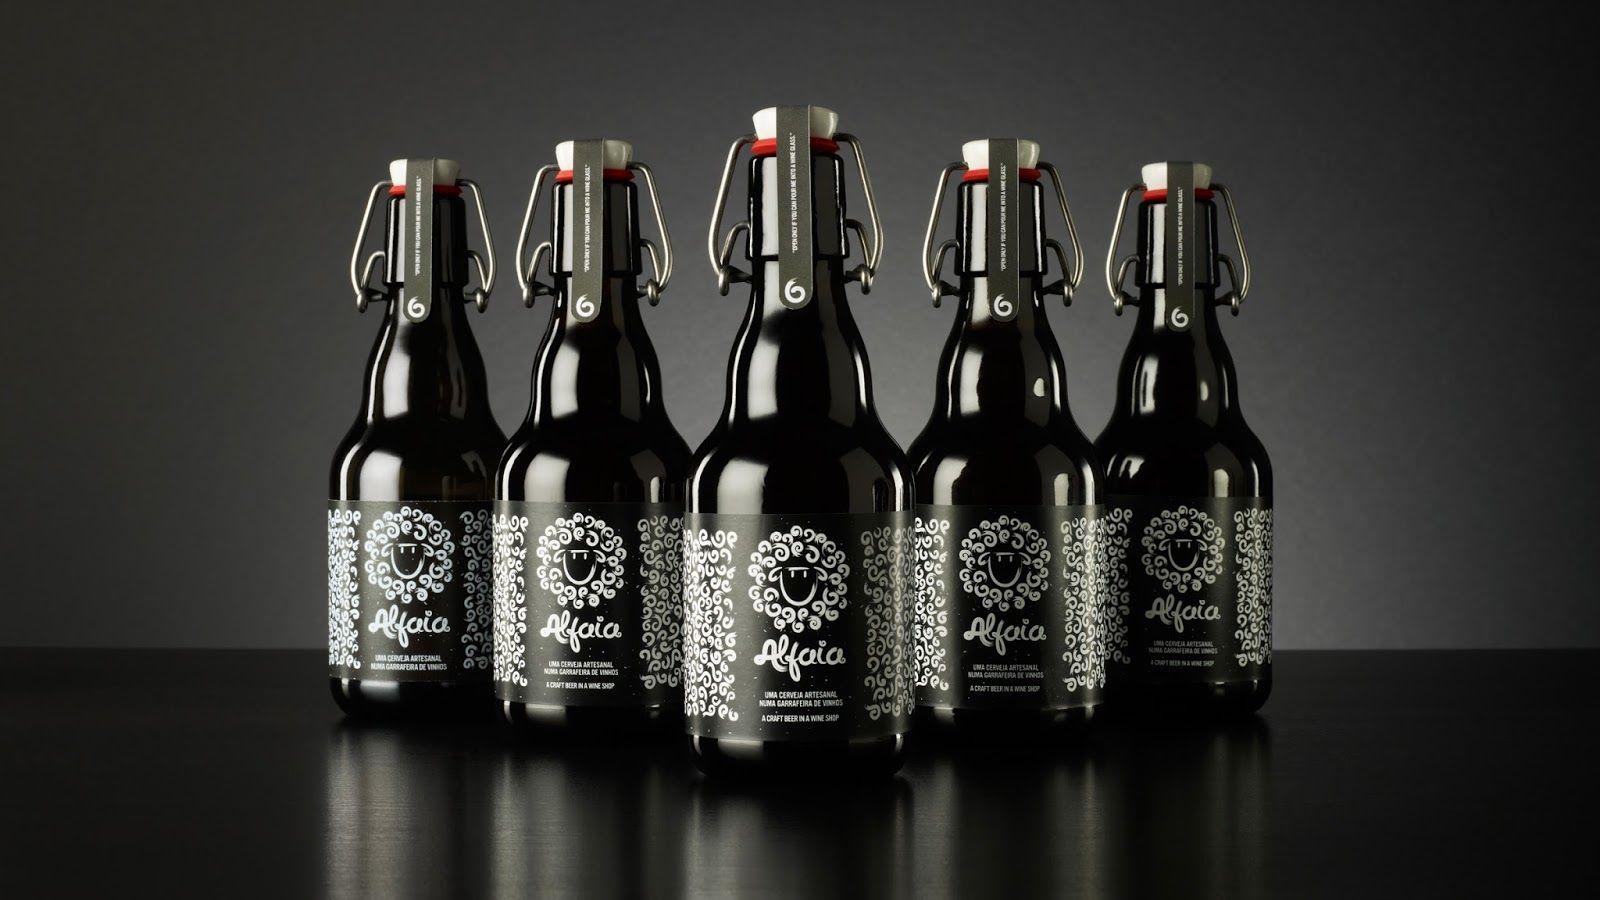 alfaia cerveza